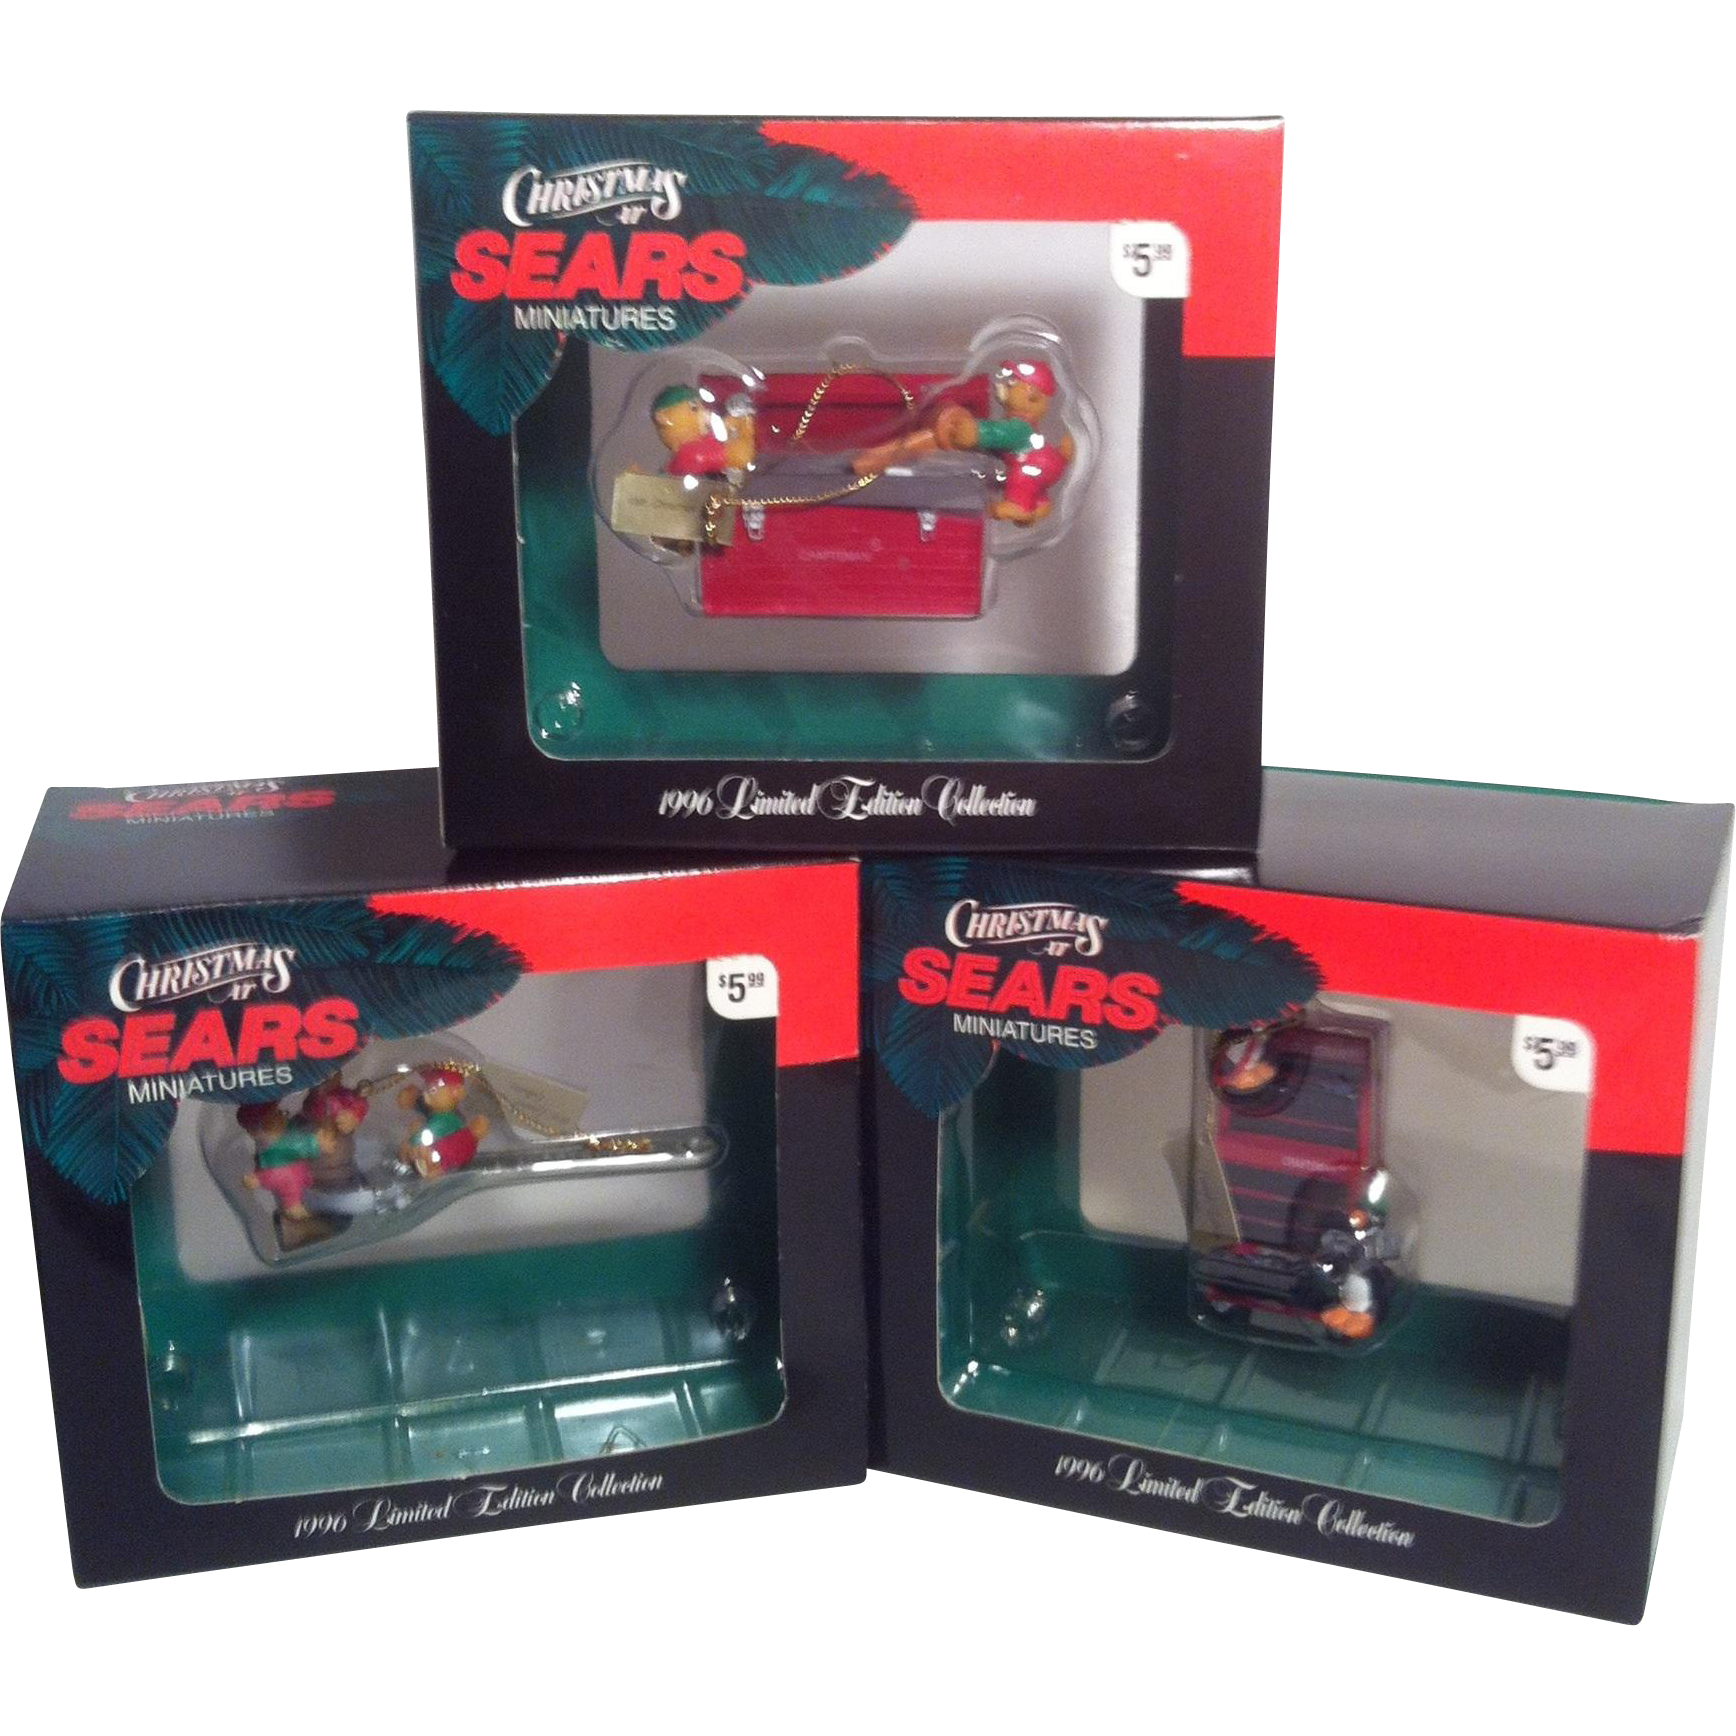 1996 Craftsman Limited Edition Miniature Ornaments~ set of three